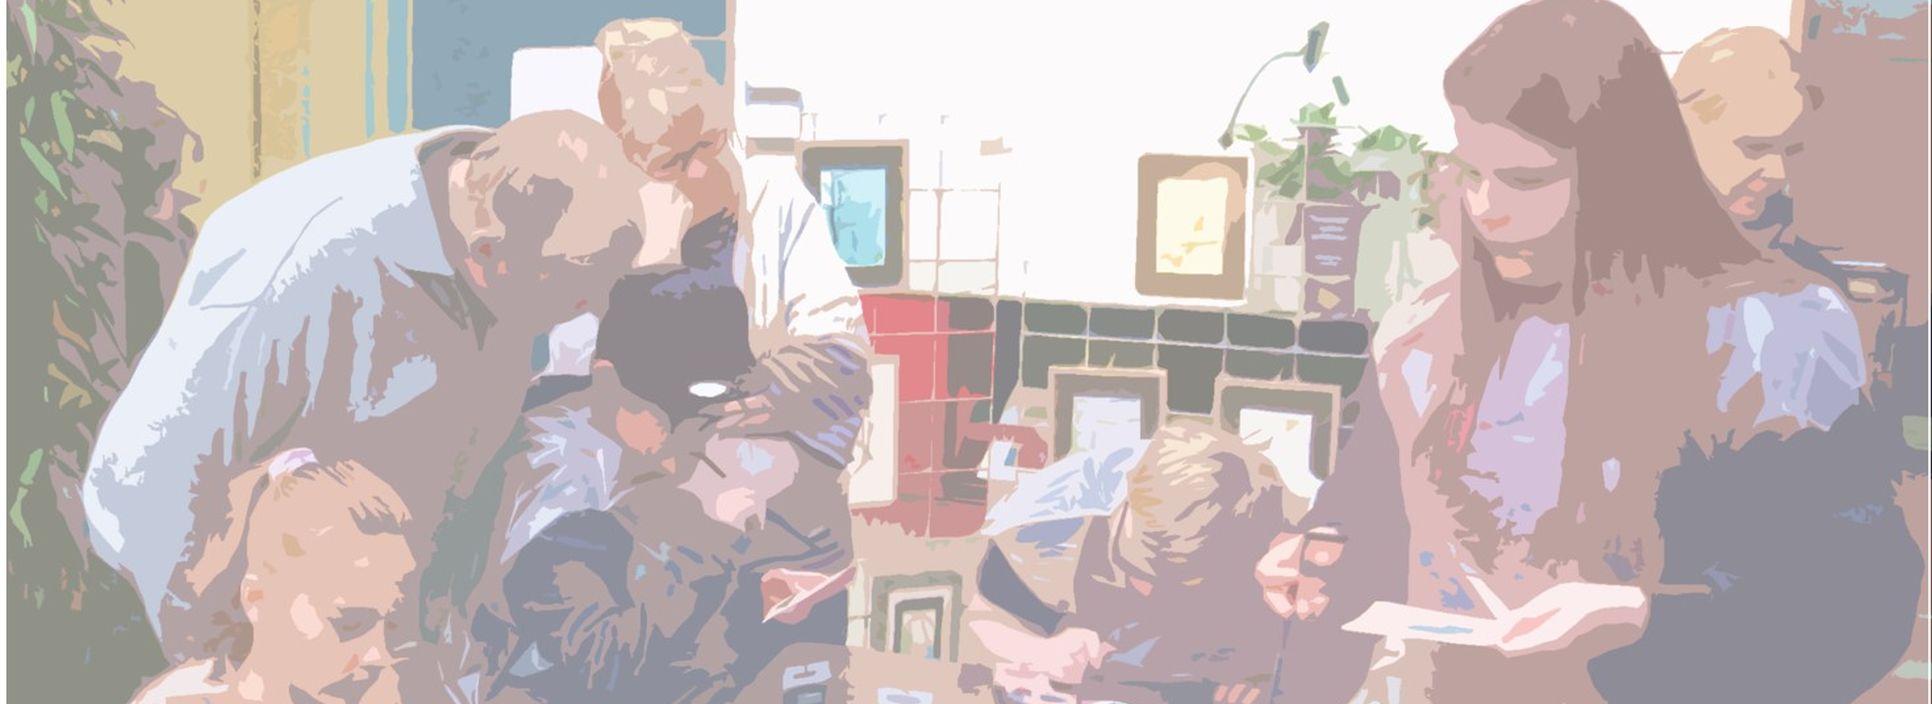 Kreativ Energi - Malerkurser for børn og voksne